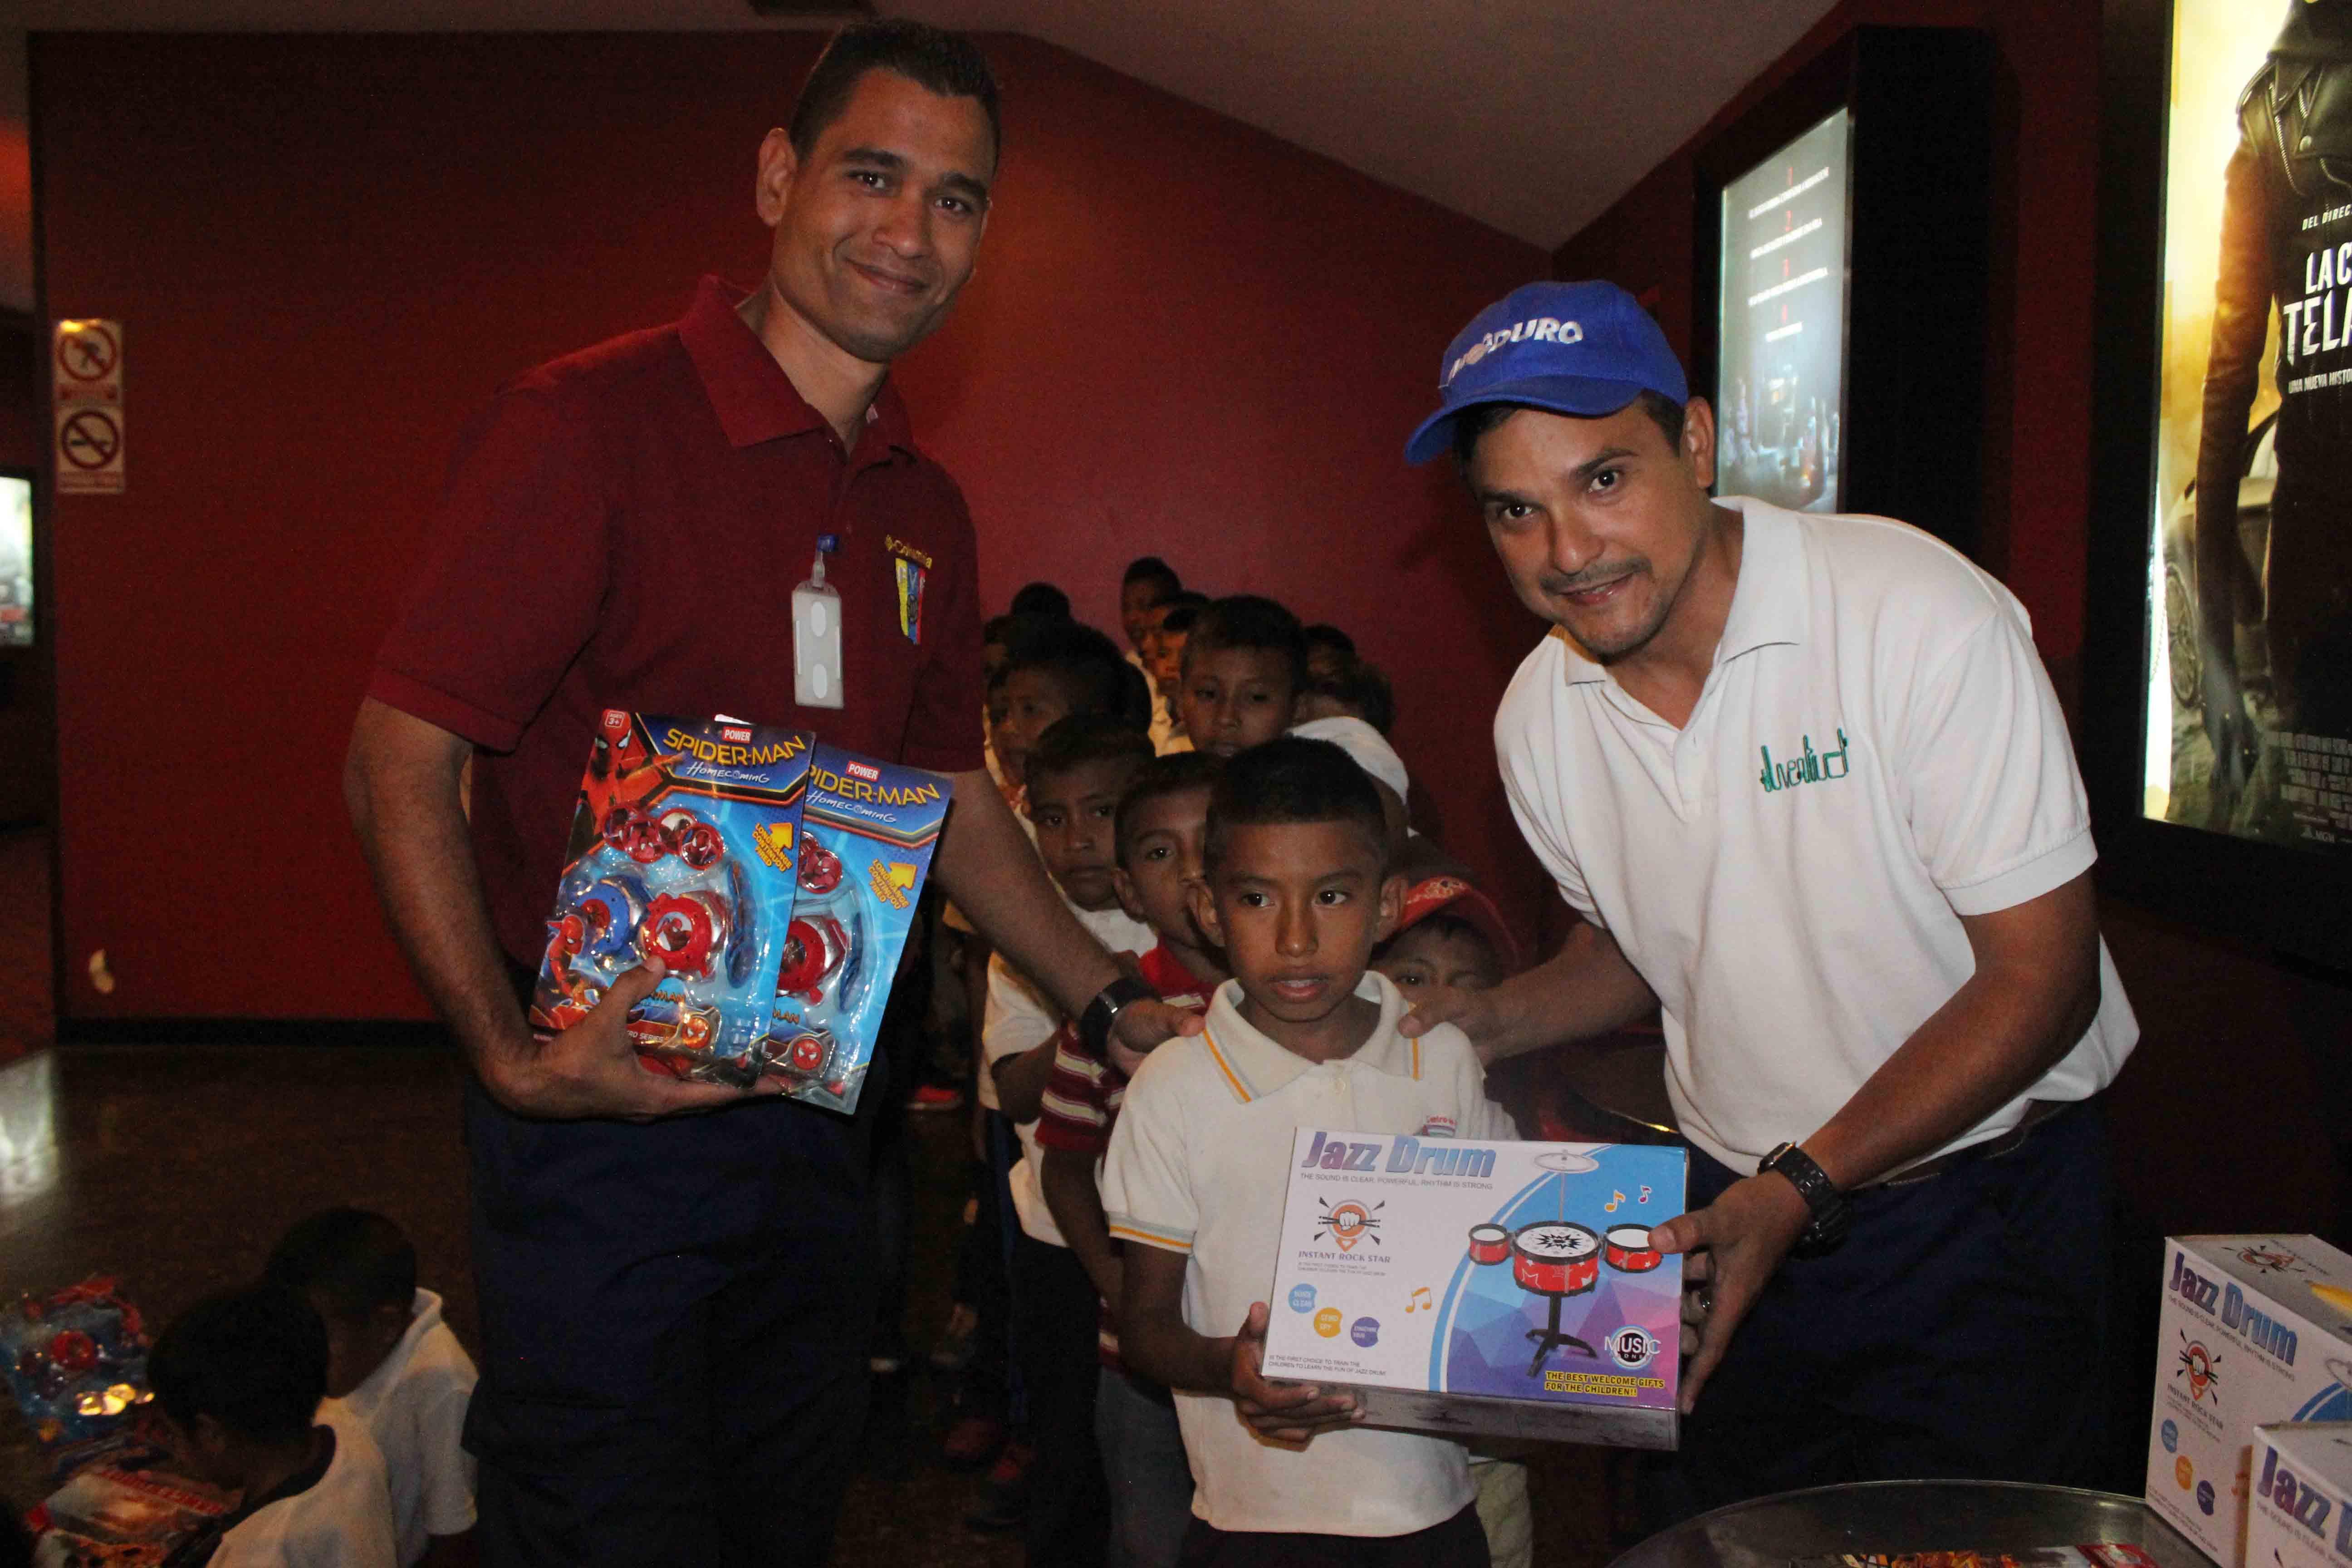 Gmcp garantiza Navidades Felices a través de cine-foro y entrega de juguetes (16)